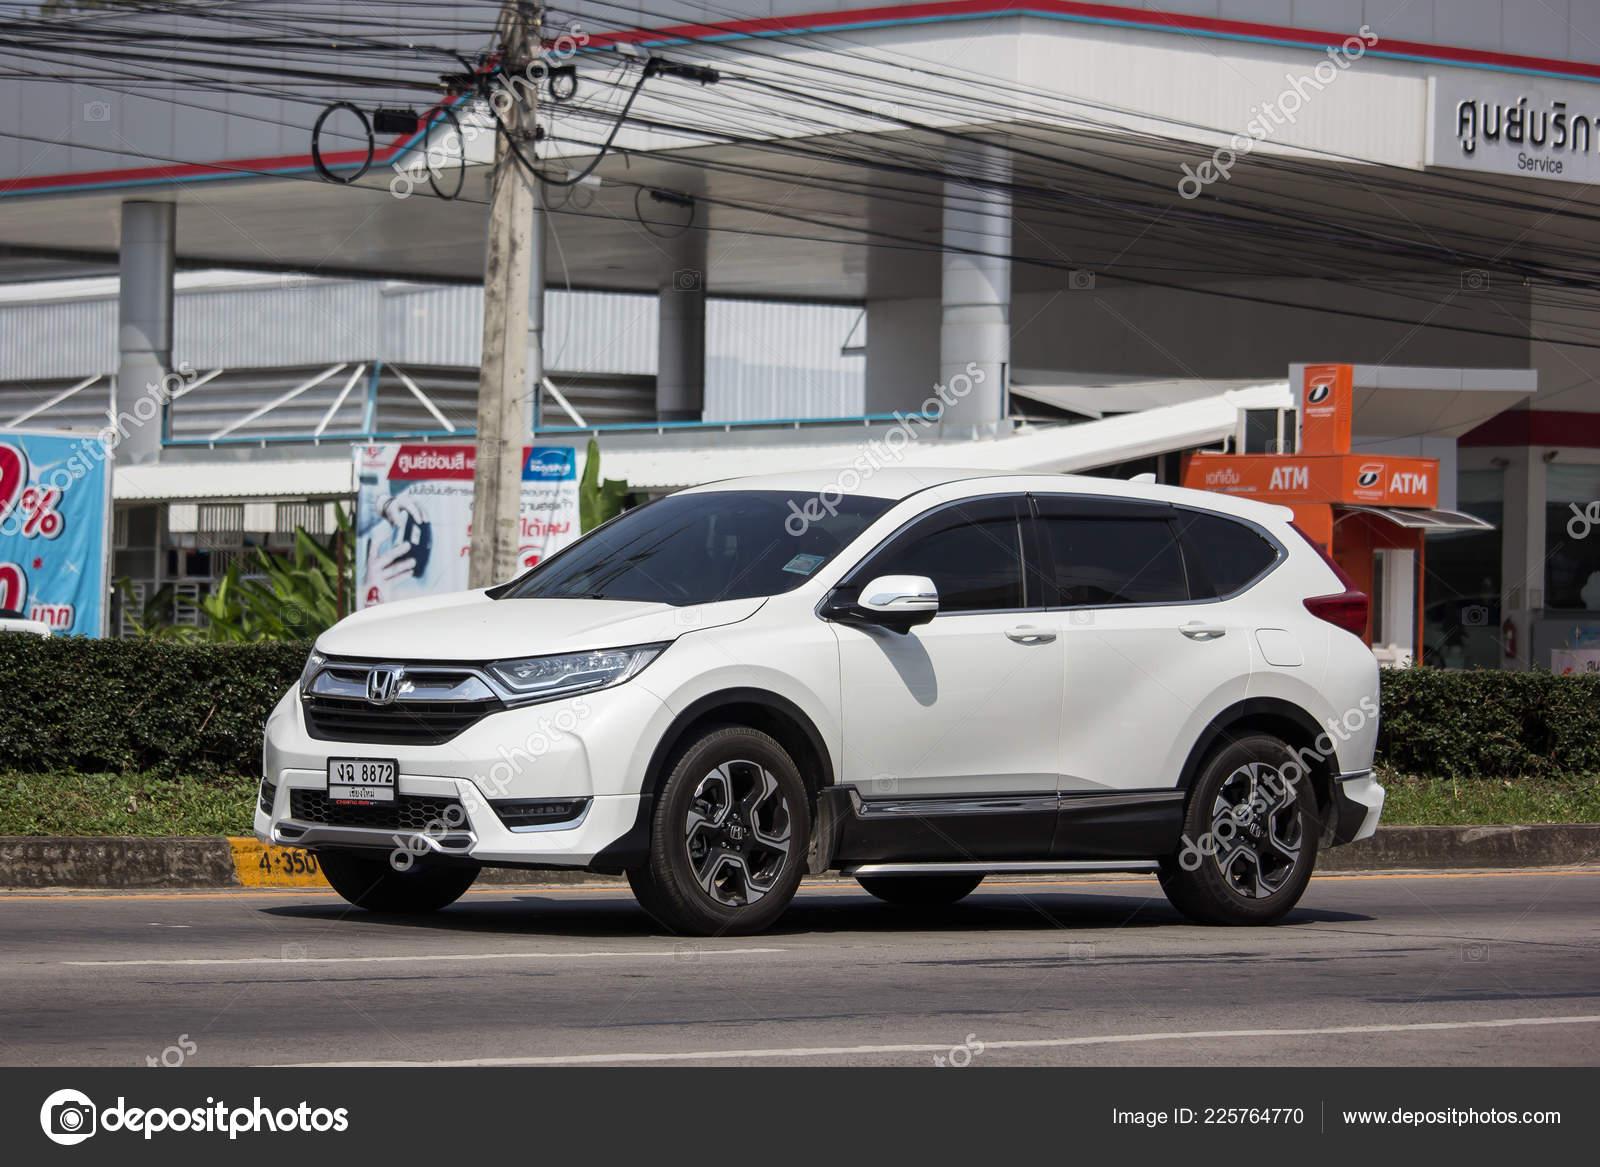 Chiangmai Thailand October 2018 Private Car Honda Crv City Suv